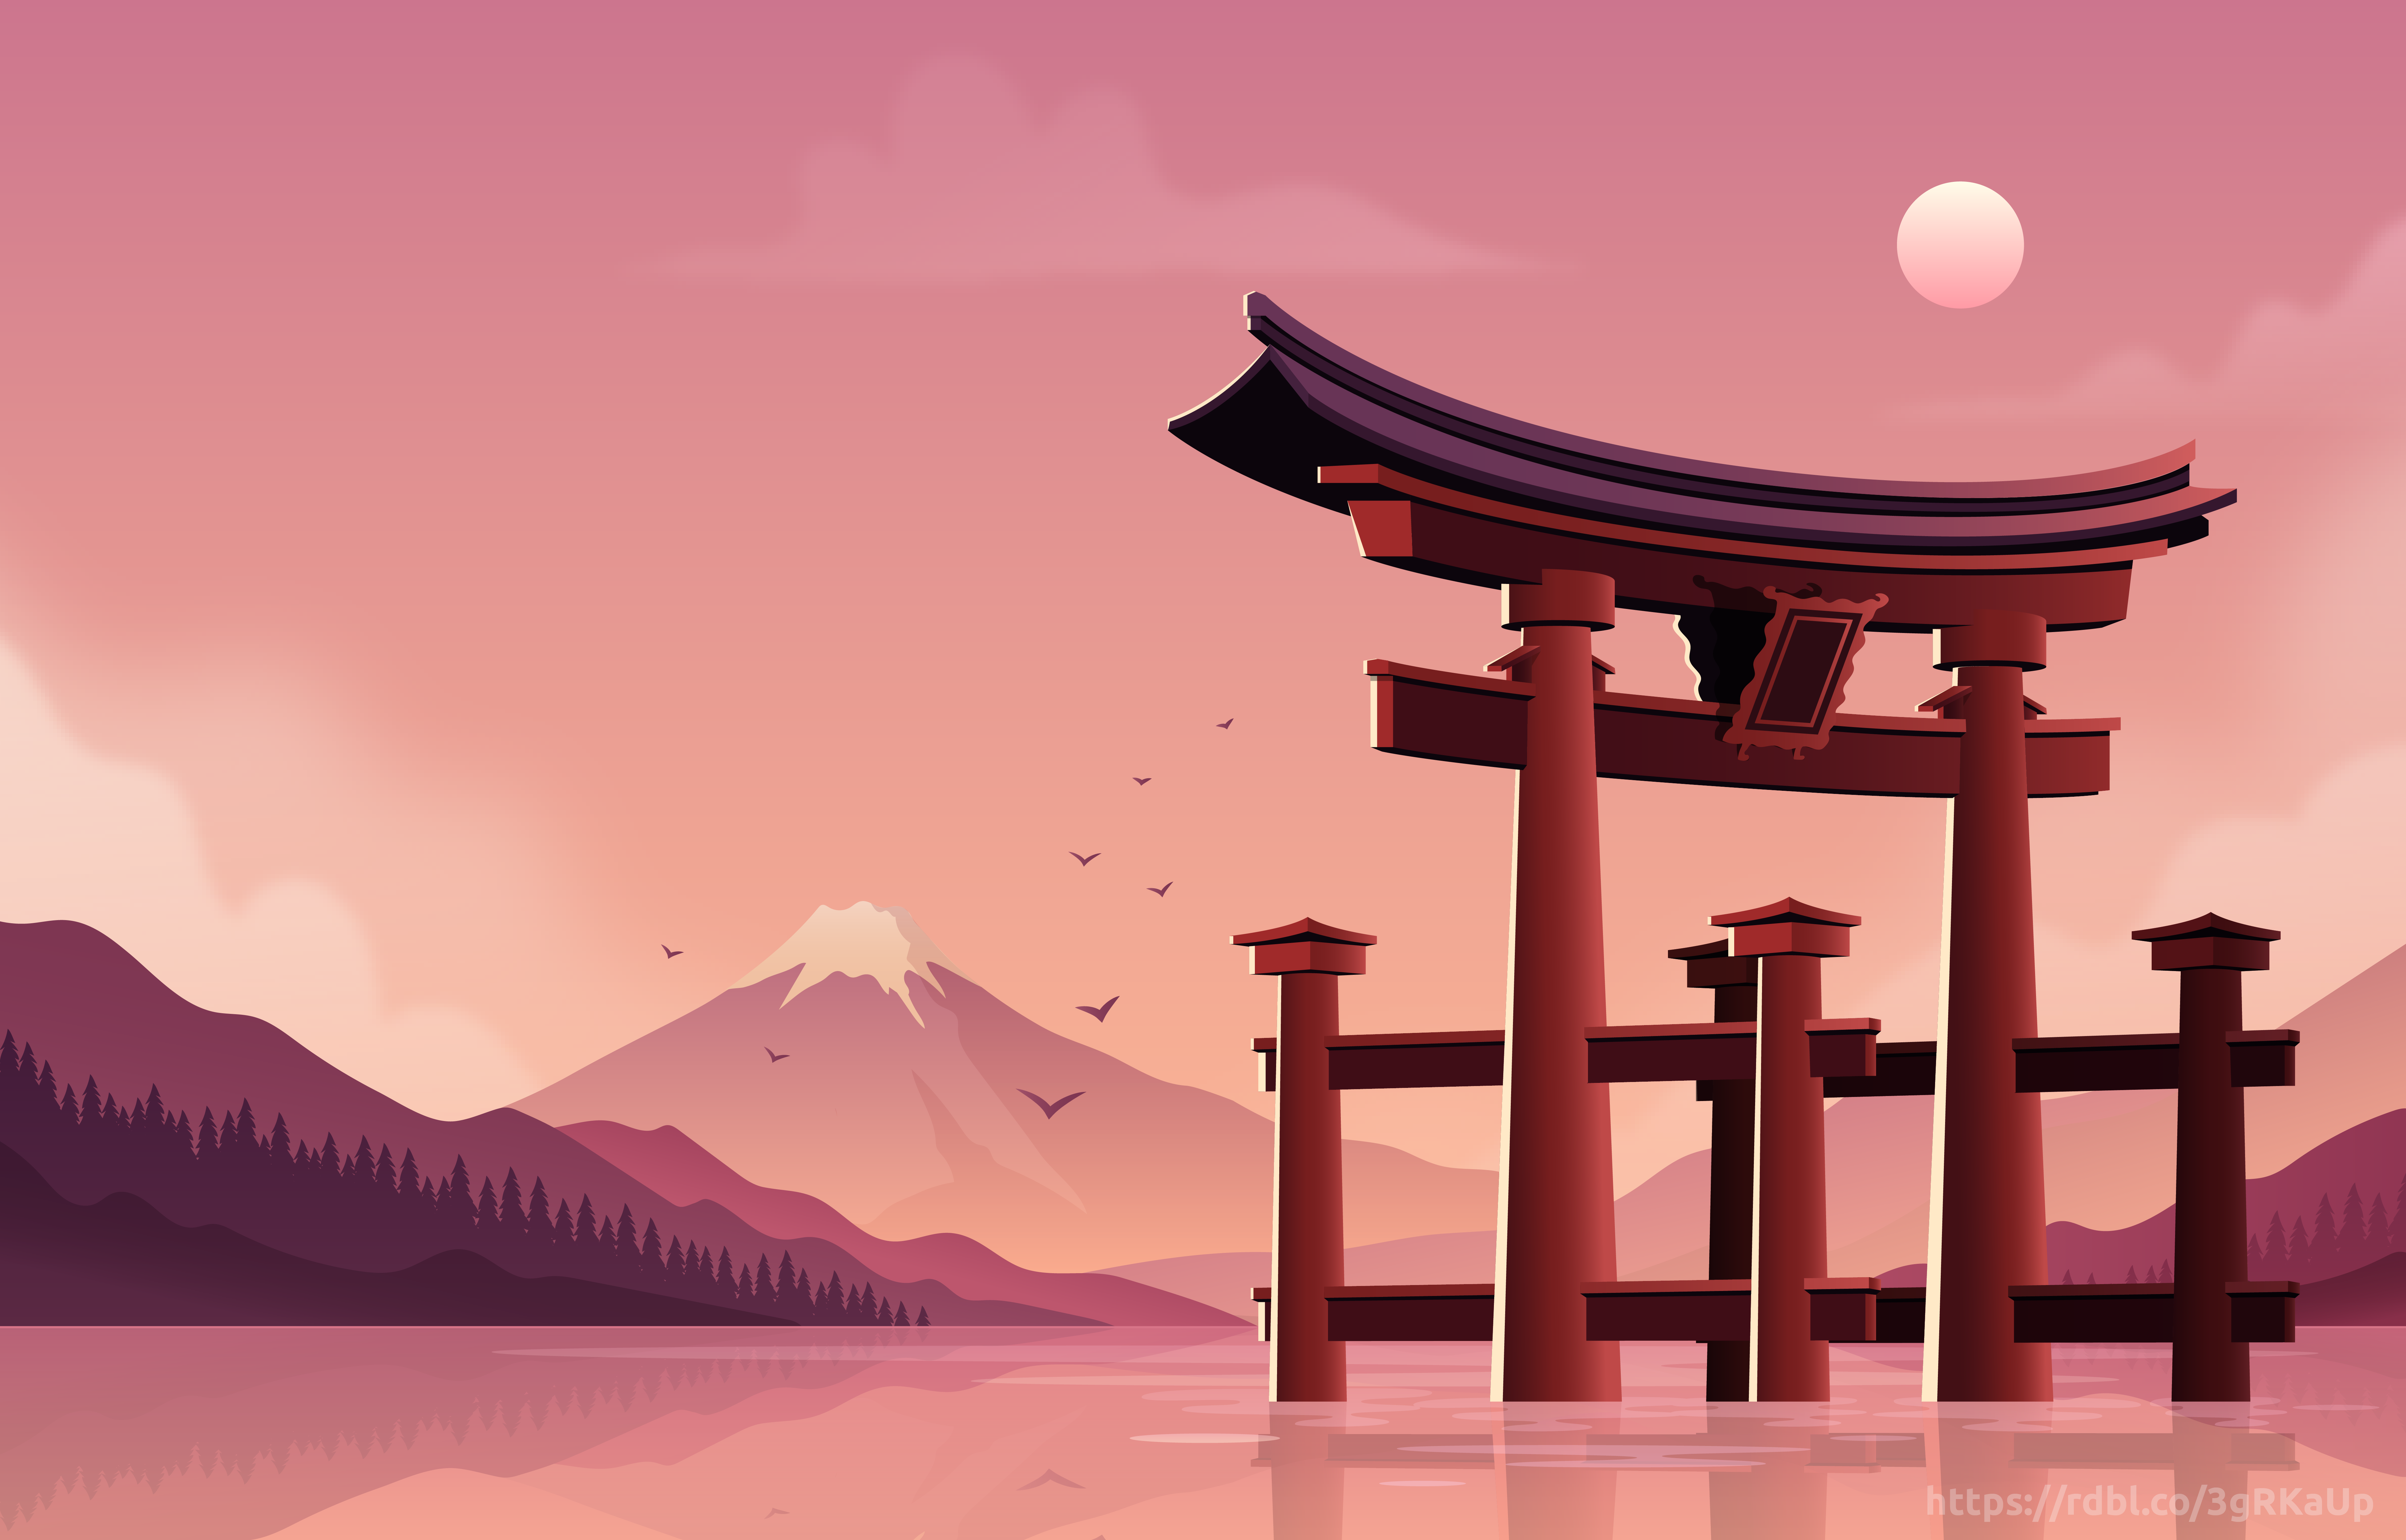 Welcometojapan Shop Redbubble Landscape Wallpaper Aesthetic Desktop Wallpaper Anime Backgrounds Wallpapers